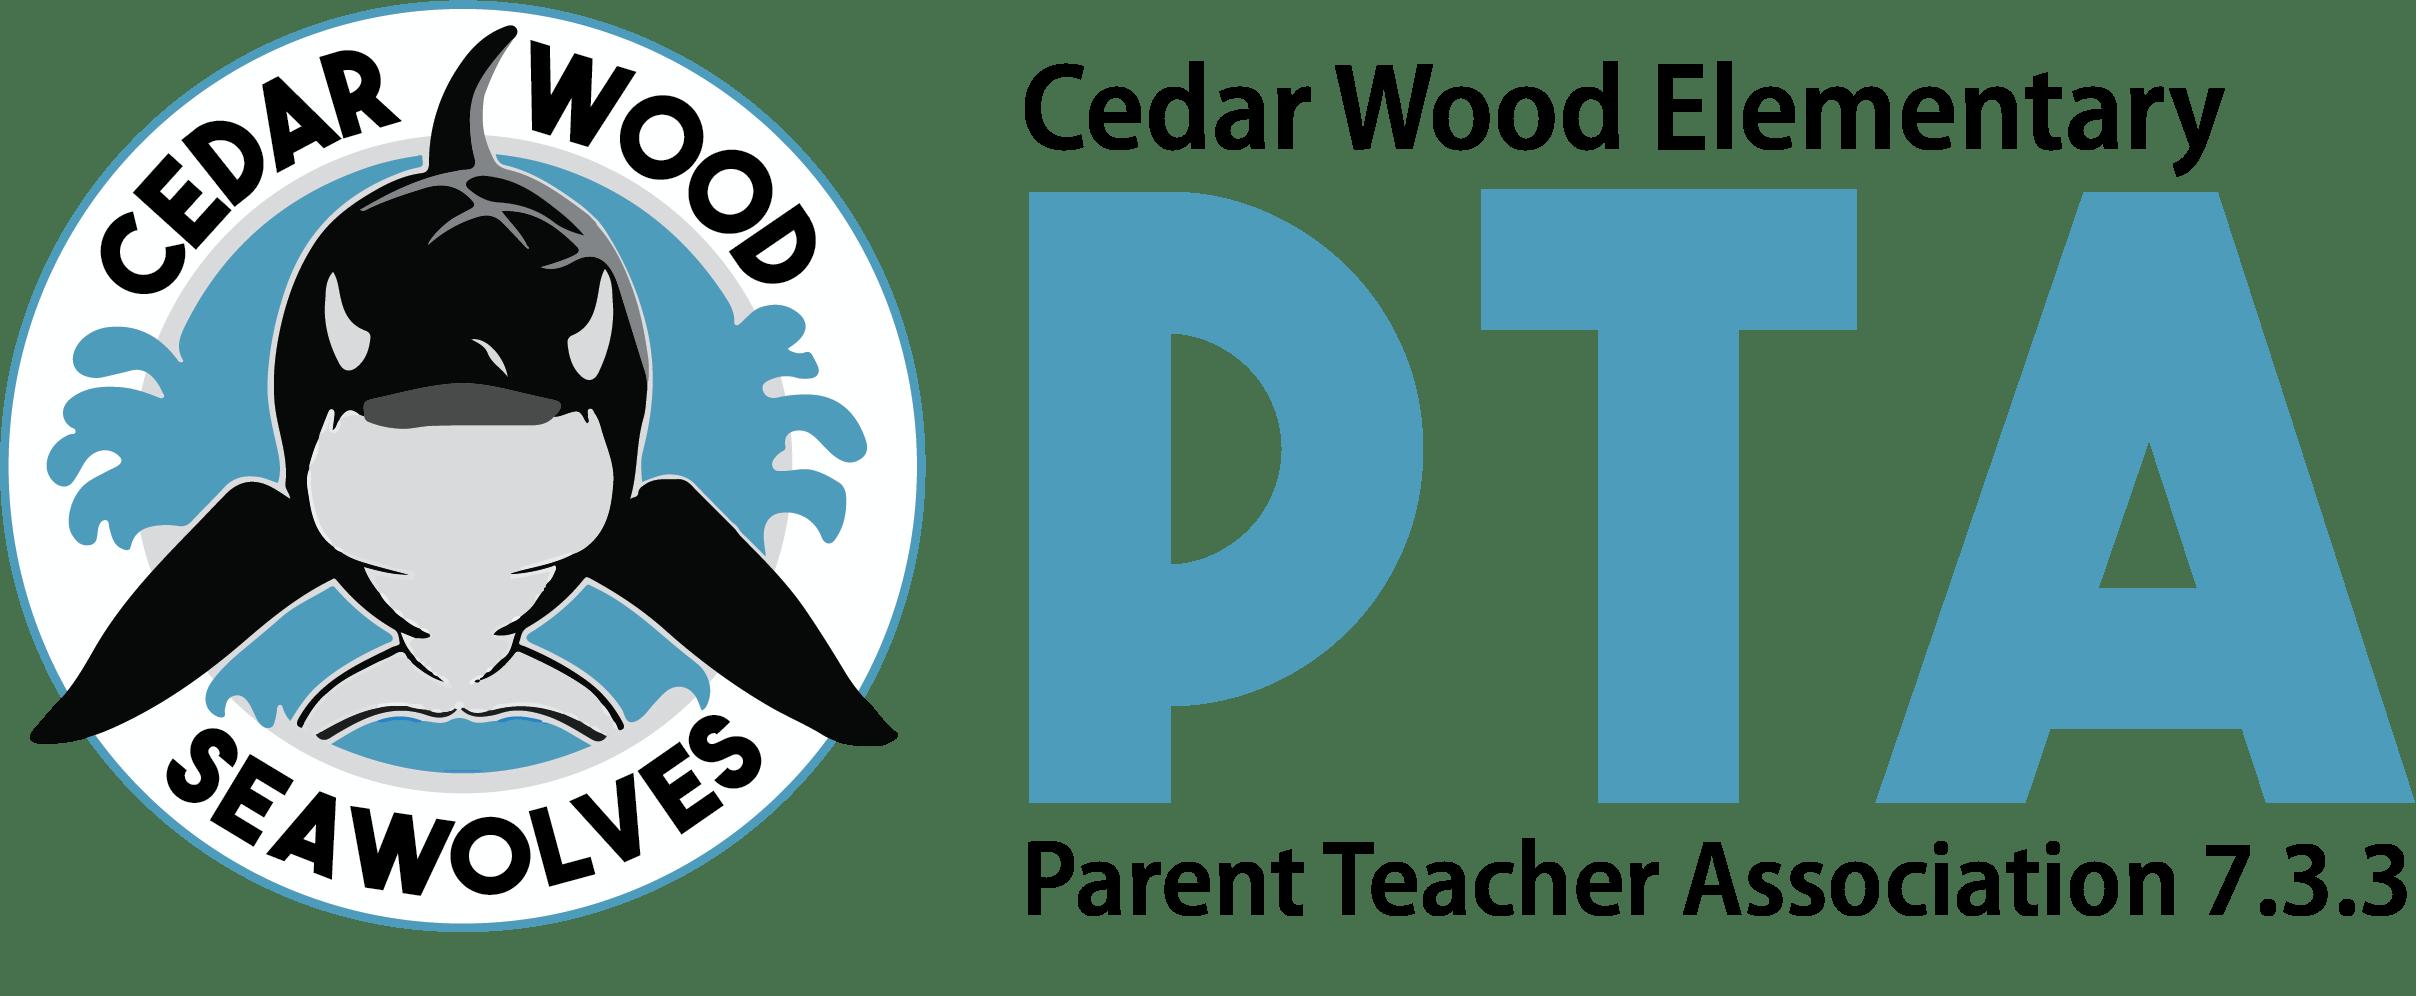 Cedar Wood Elementary PTA